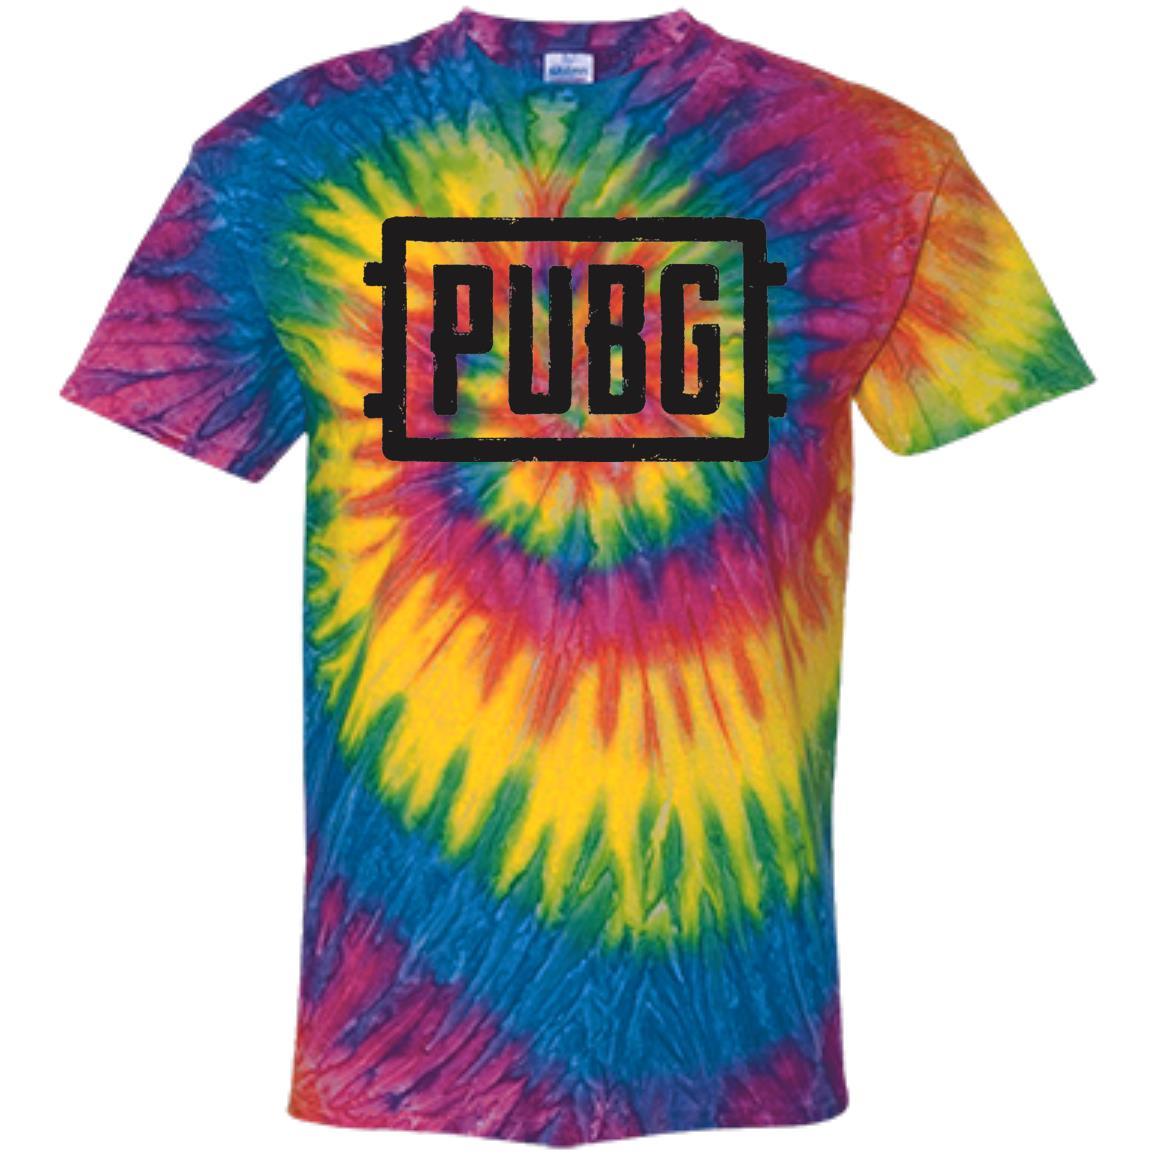 Super Post Malone PUBG Tie Dye T-Shirt - Rockatee TE68